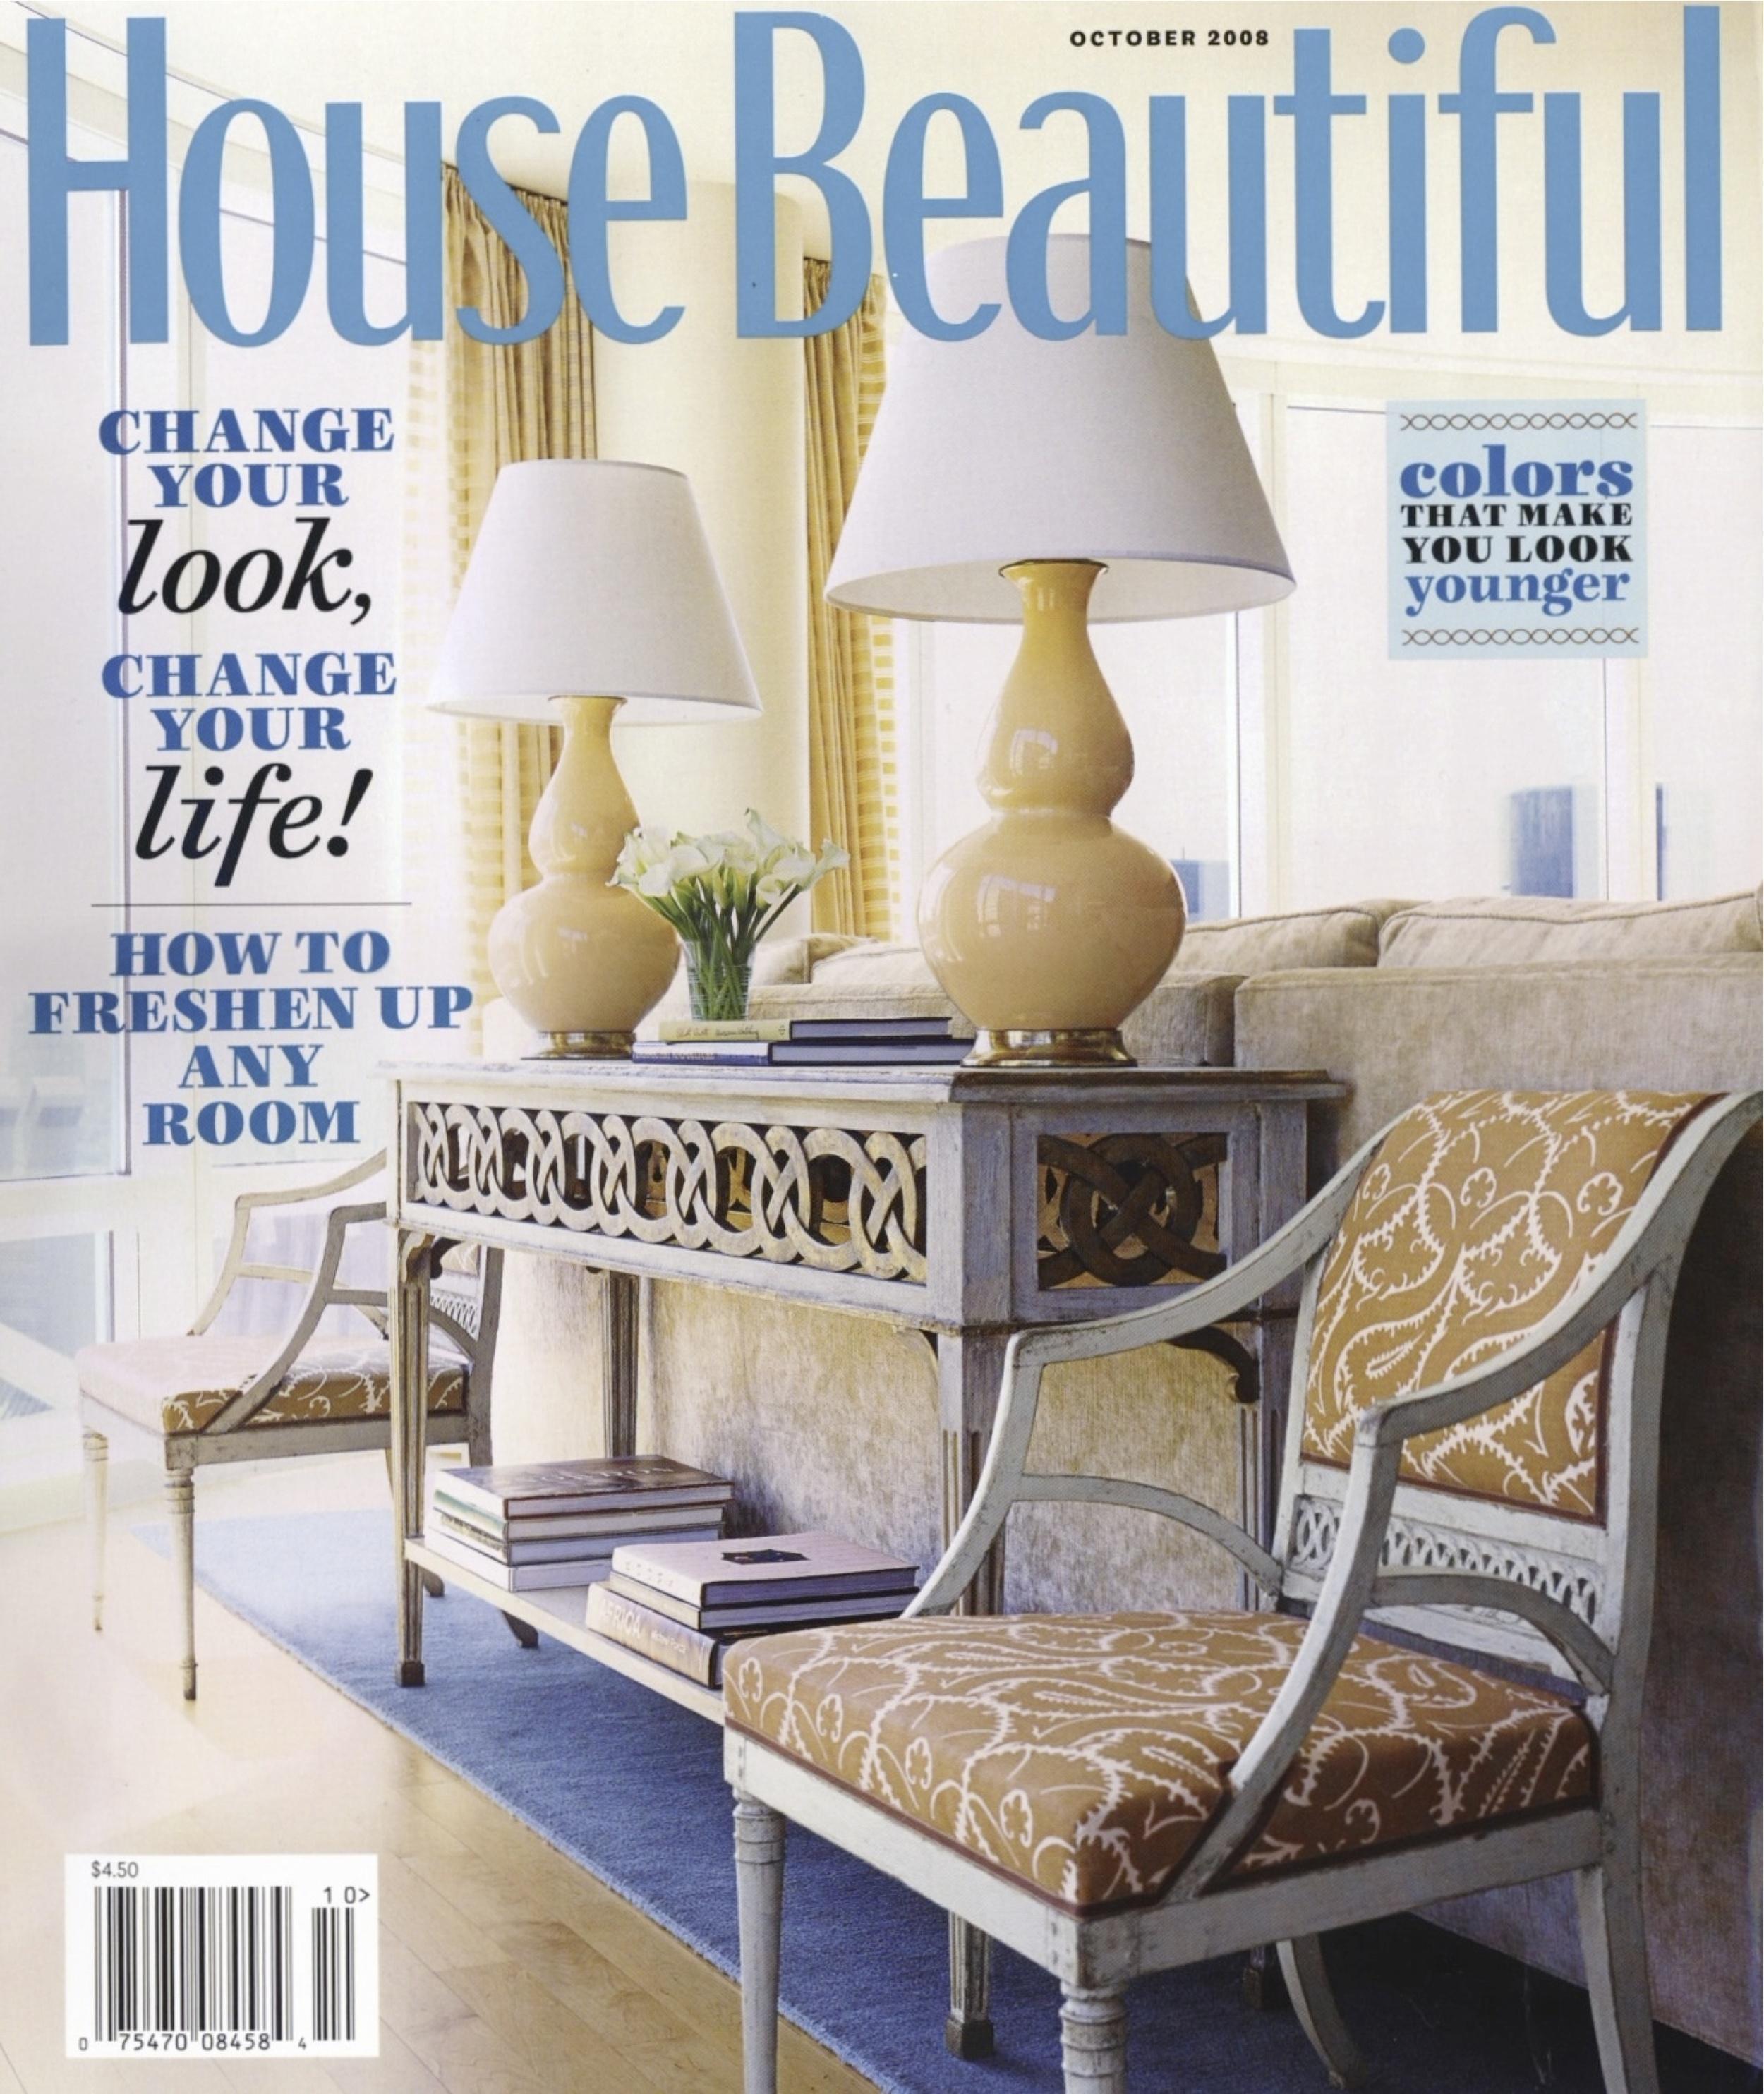 House Beautiful 08.10.jpg